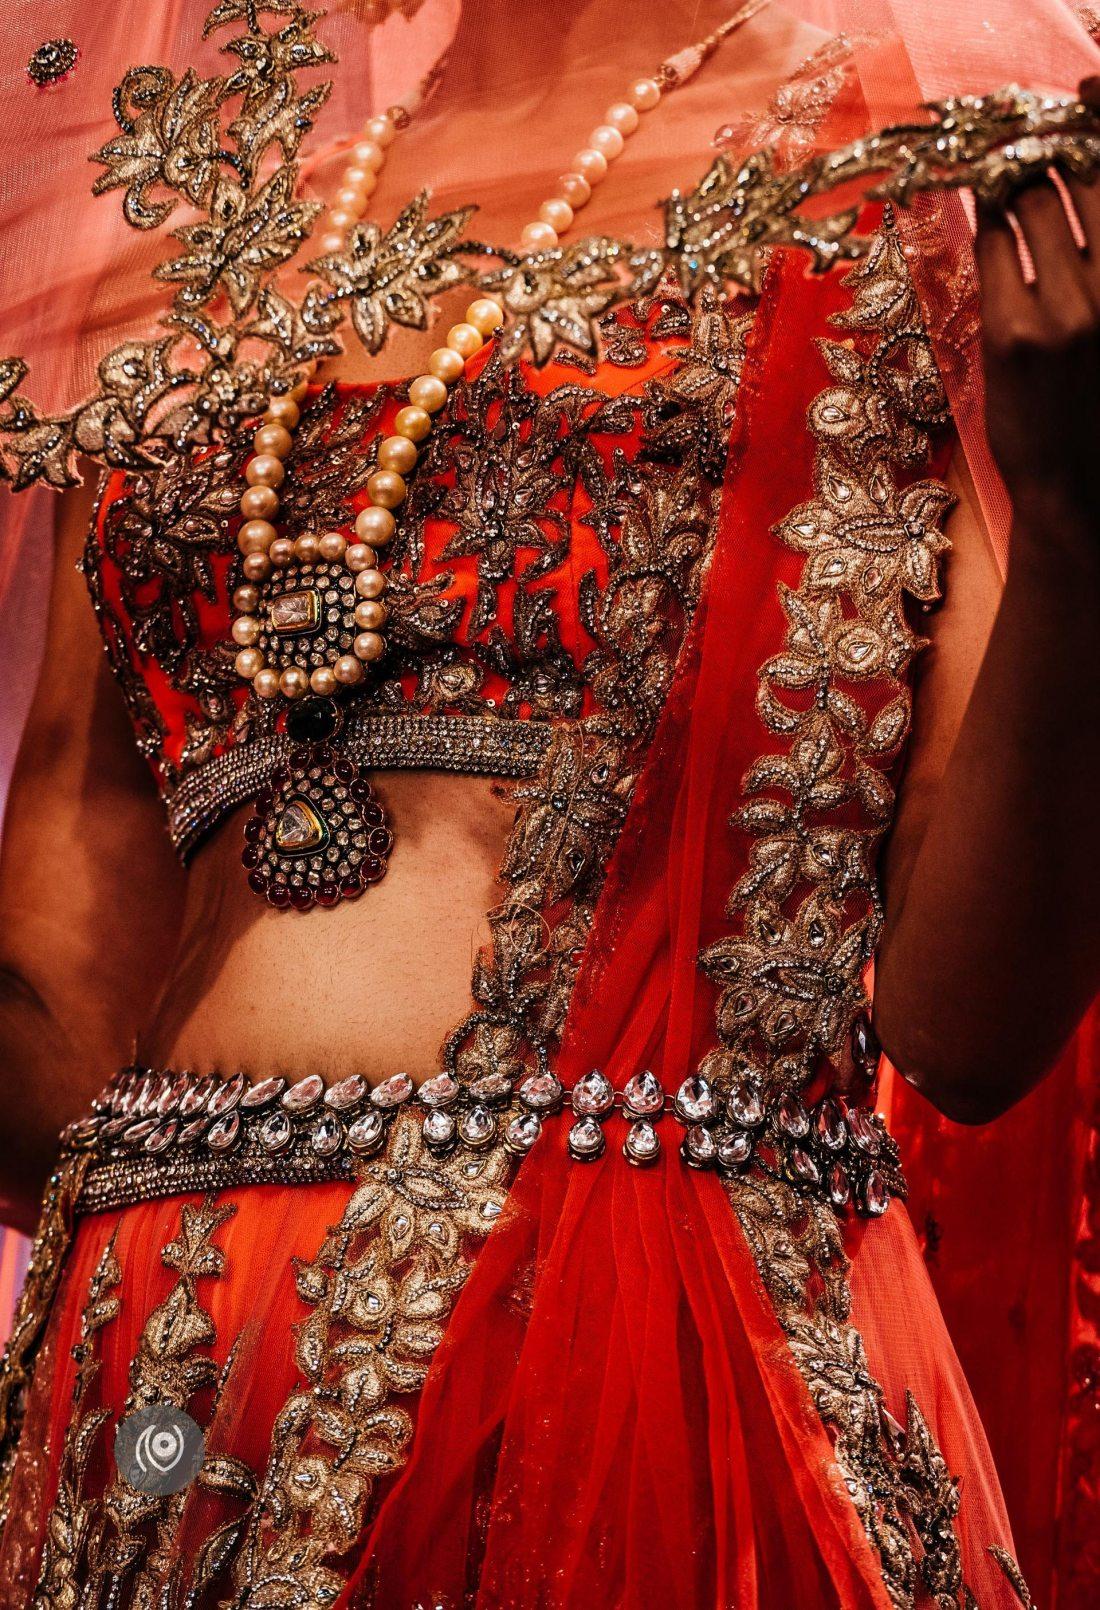 #SwarovskiCrystals Jyotsna Tiwari, BMW India Bridal Fashion Week, #BMWIBFW, Naina.co Luxury & Lifestyle, Photographer Storyteller, Blogger #SwarovskiCouture